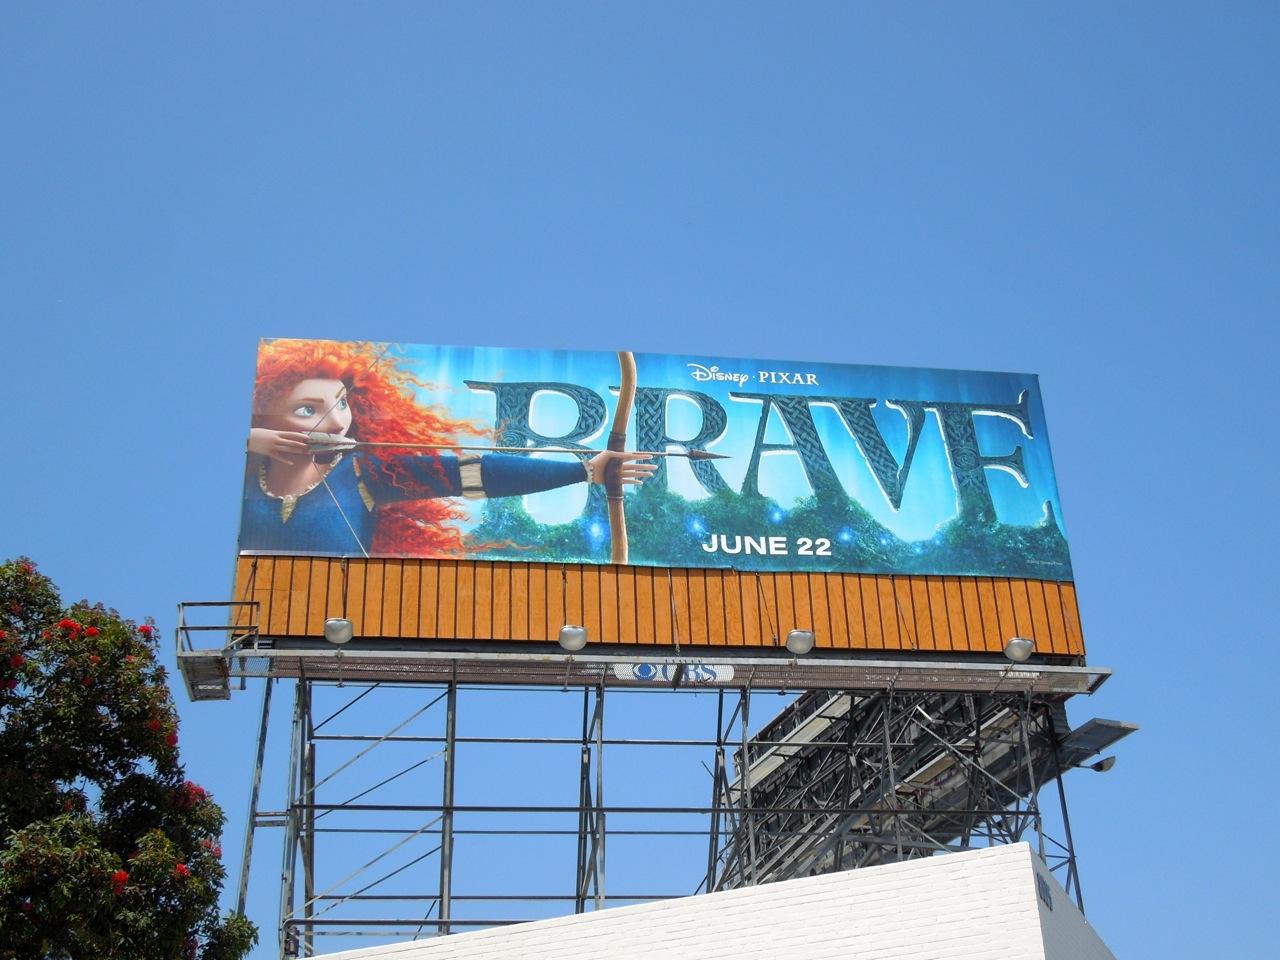 Daily Billboard Giant Brave Movie Billboards